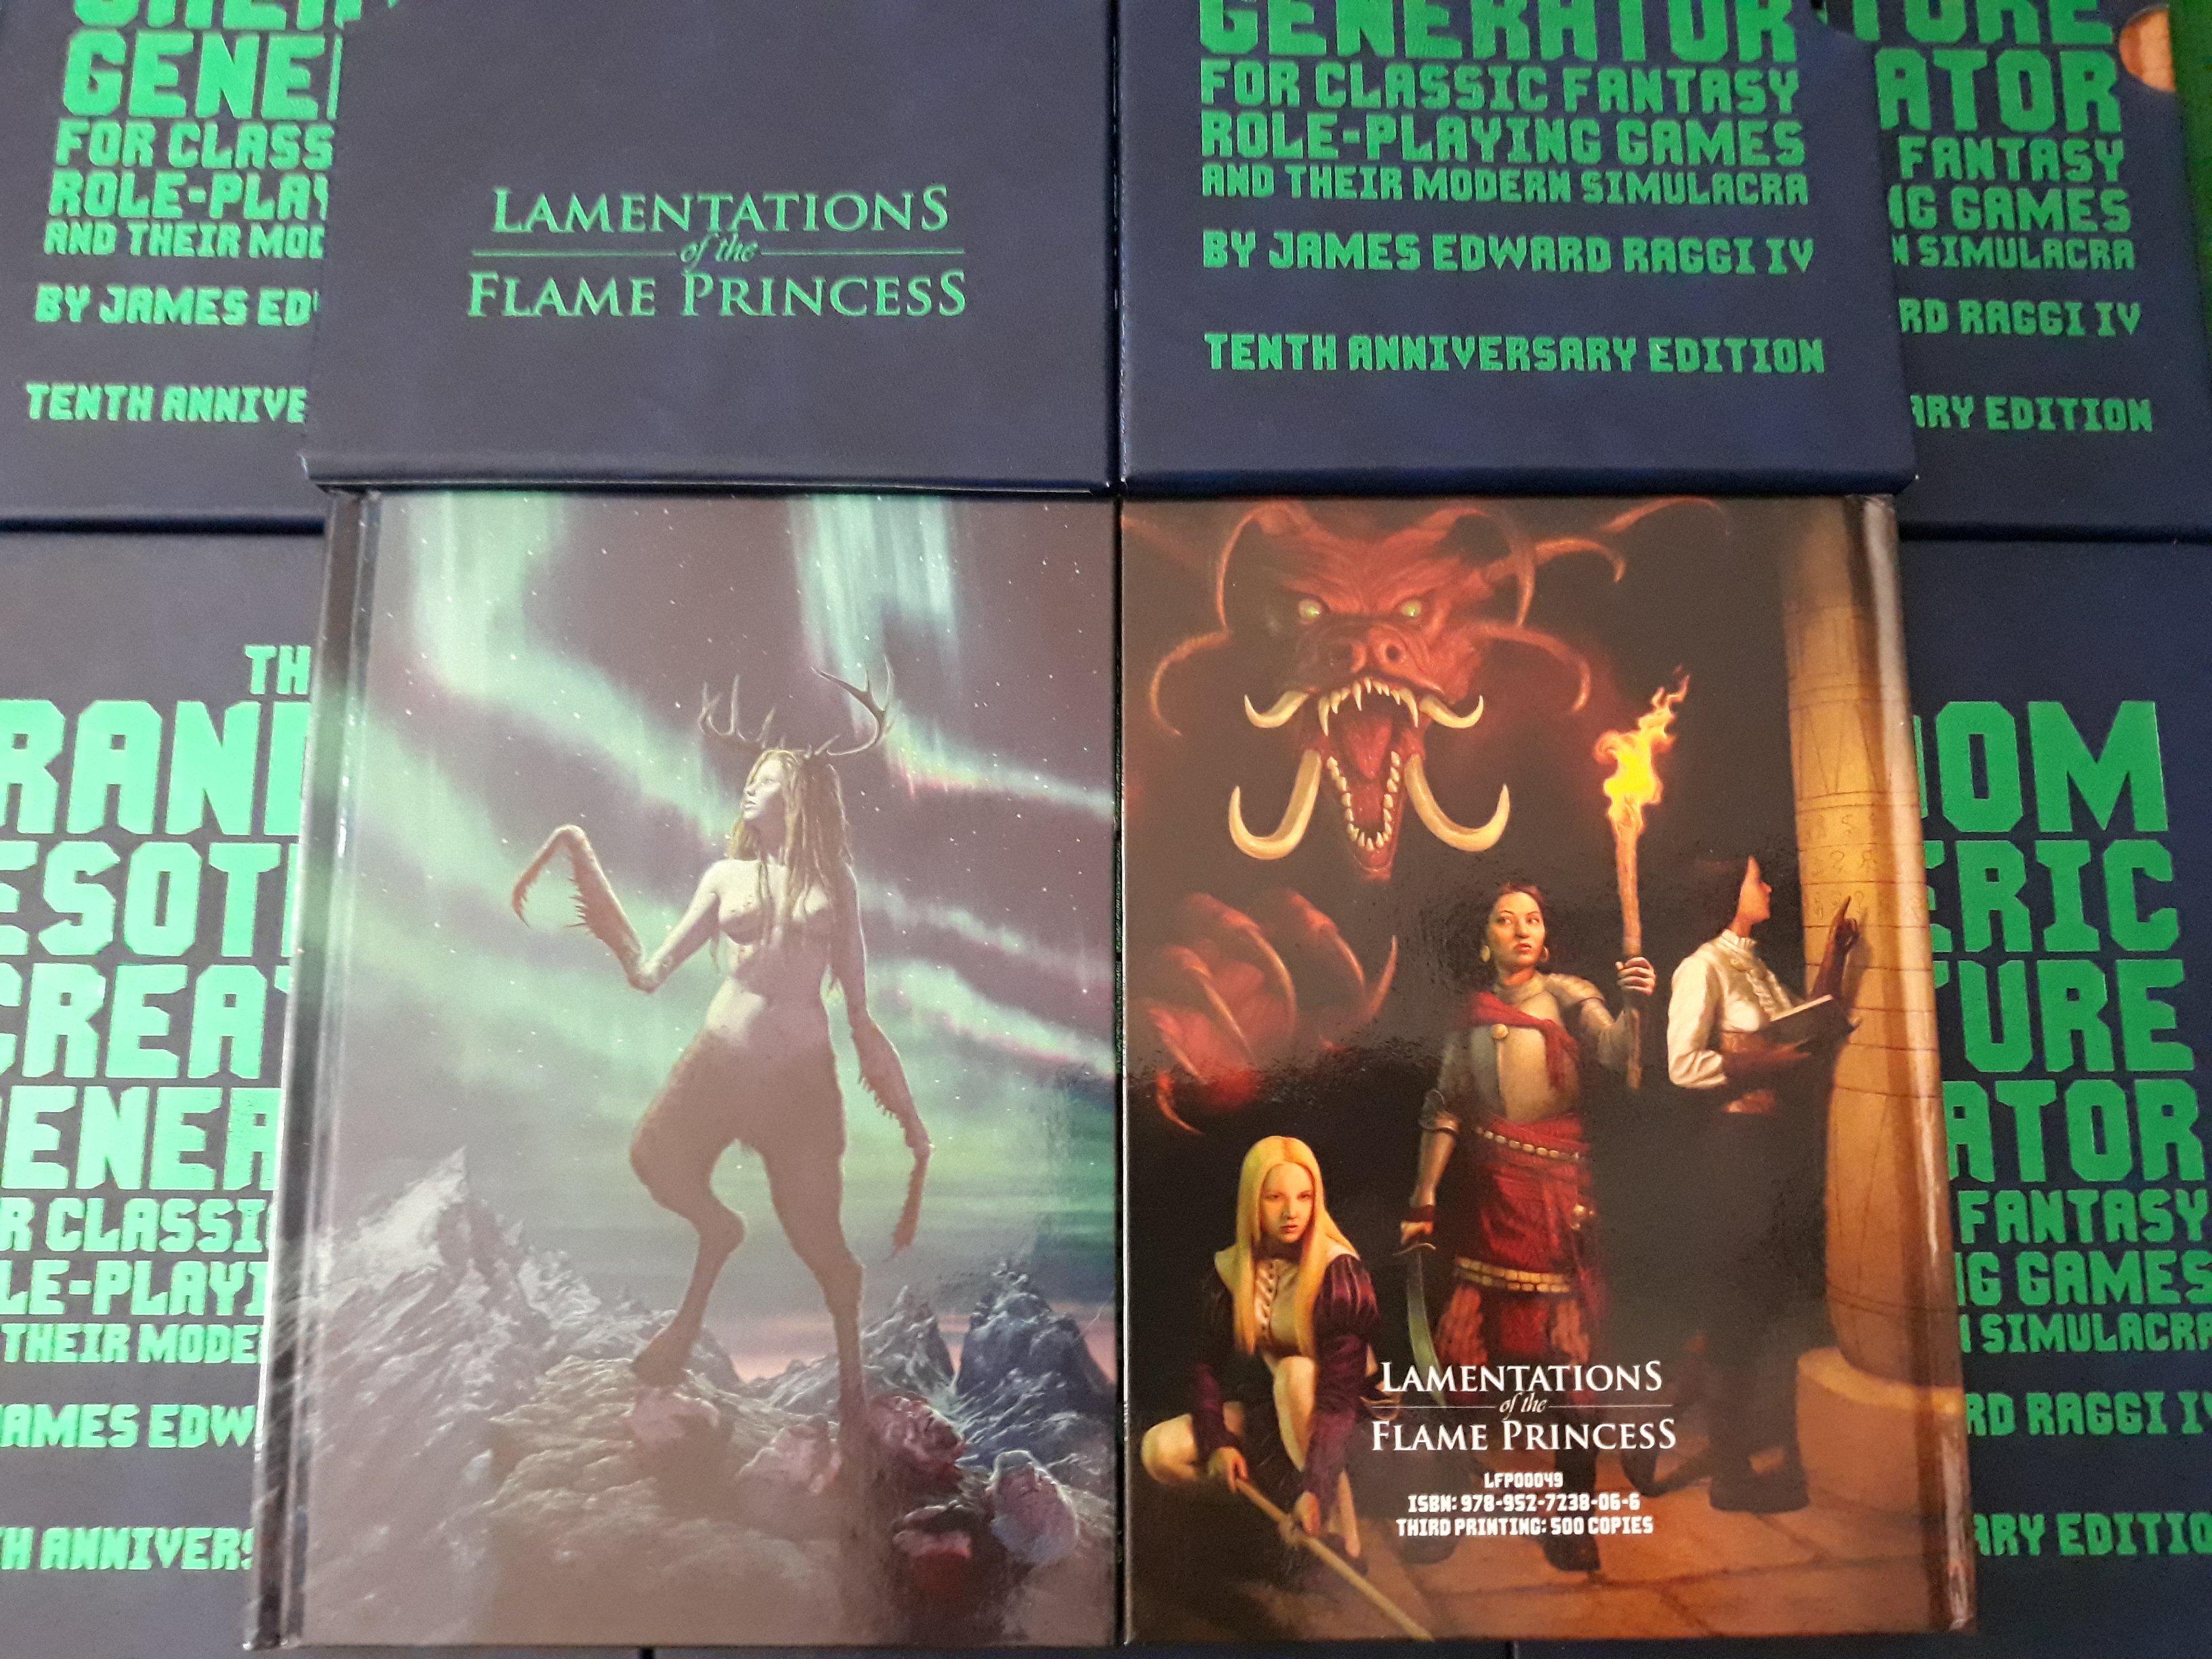 Random Esoteric Creature Generator for Classic Fantasy RPG and Their Modern  Simulacra